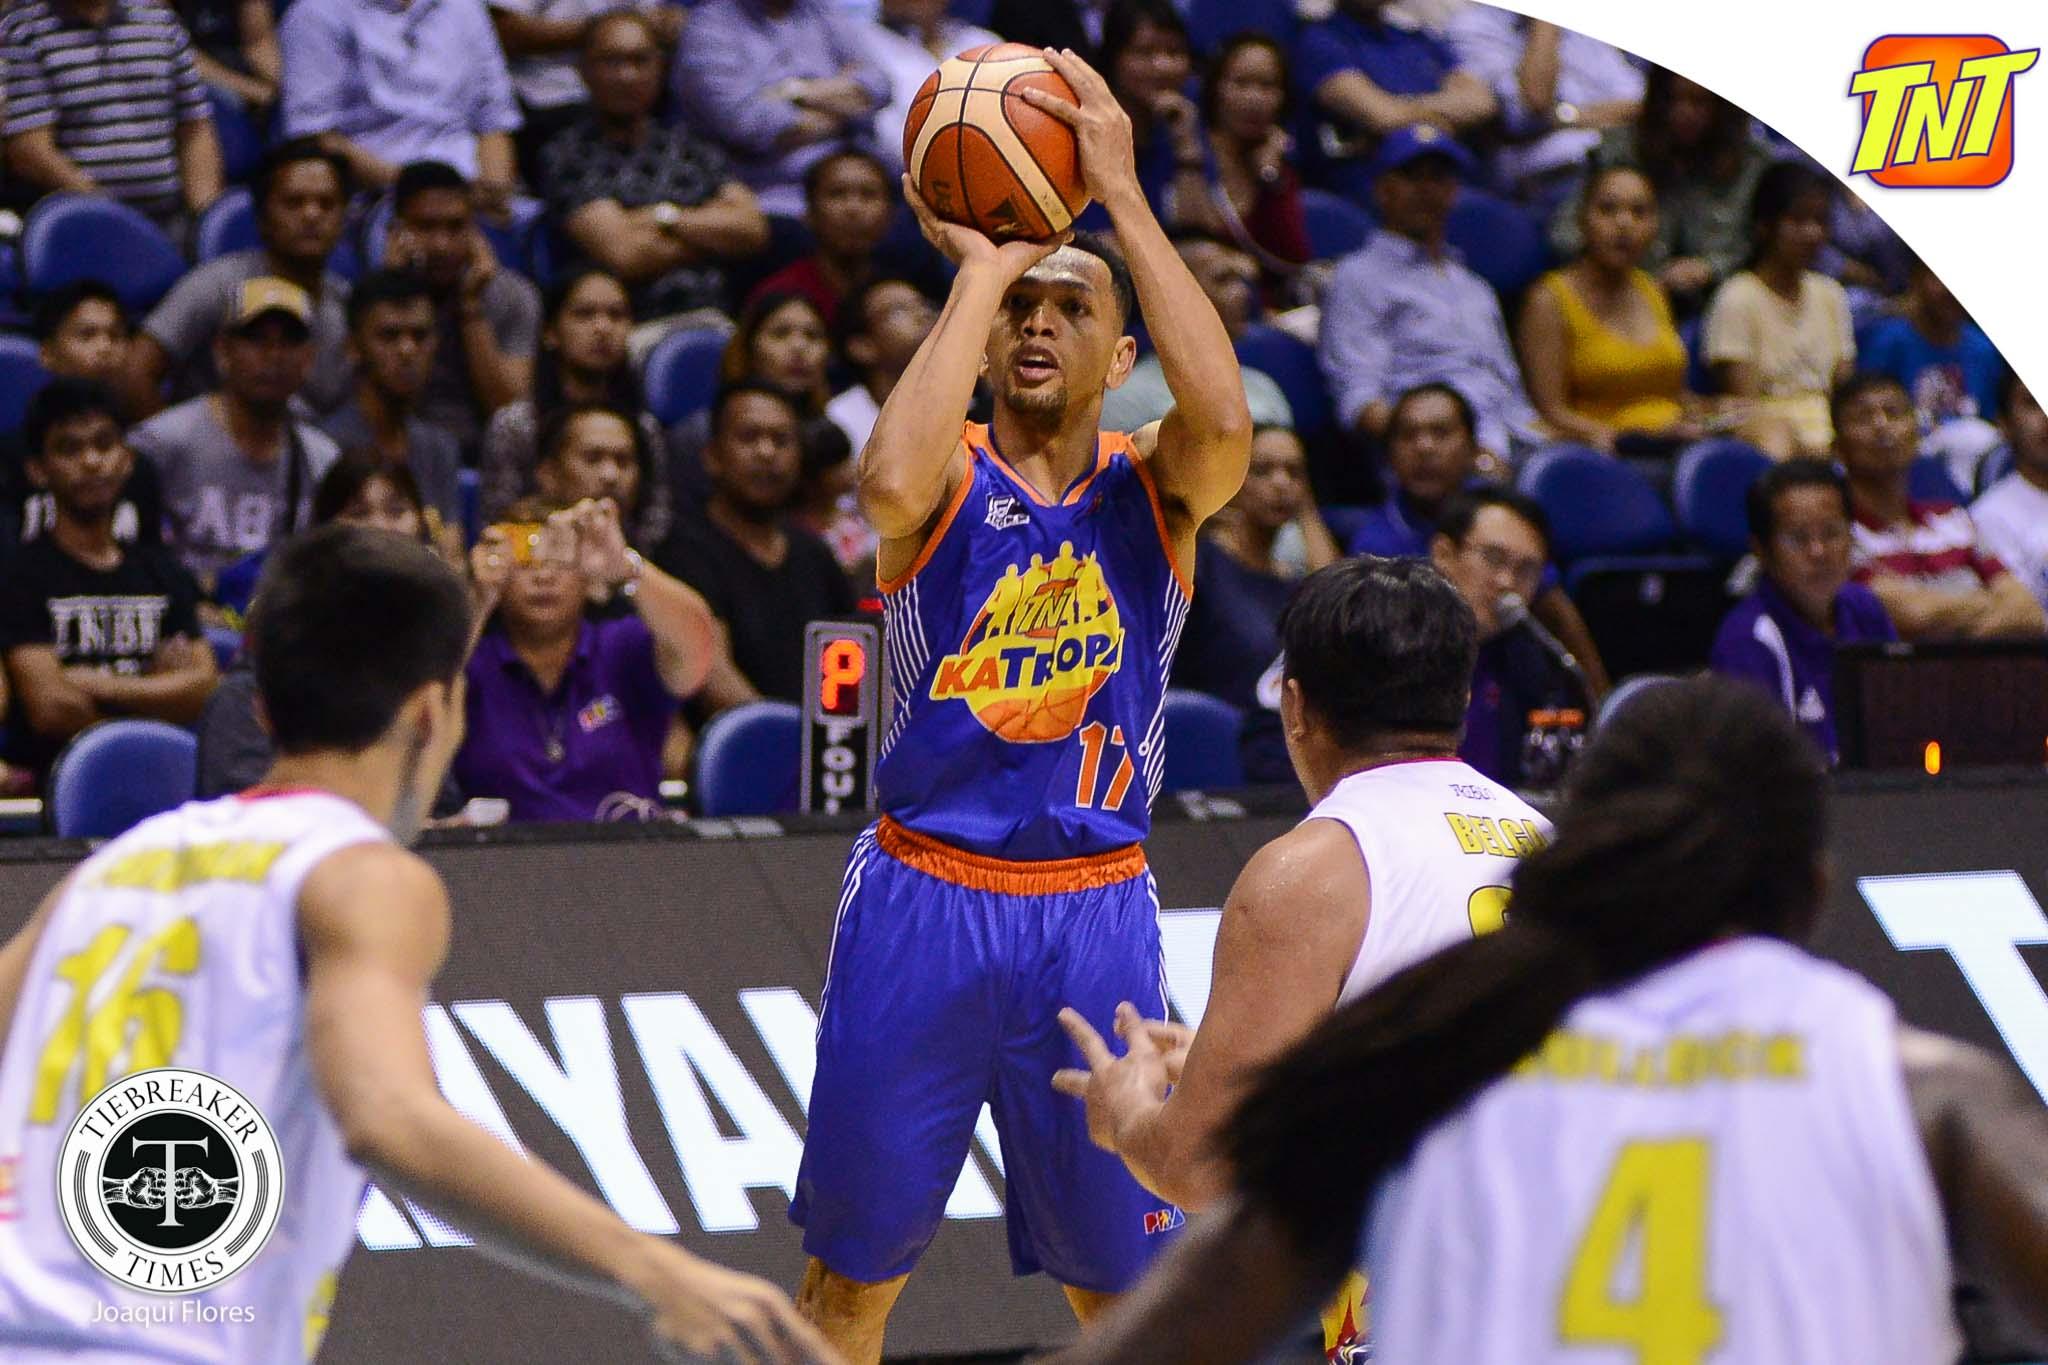 Philippine Sports News - Tiebreaker Times Jayson Castro the Facilitator steps up for TNT in semis-clinching win Basketball News PBA  TNT Katropa PBA Season 42 Jayson Castro Glen Rice Jr. 2017 PBA Governors Cup